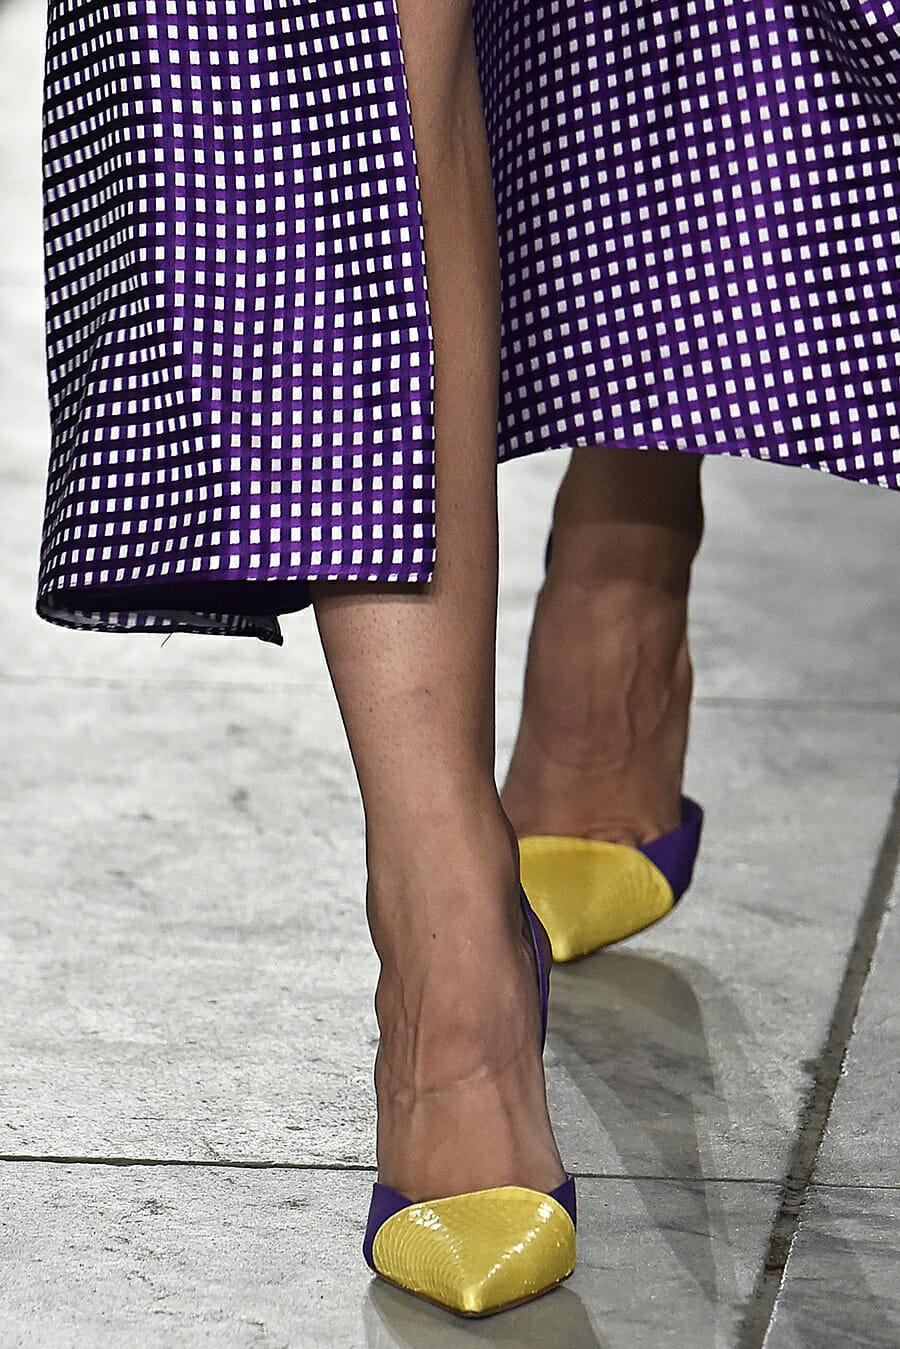 Carolina-Herrera-New-York-Fashion-Week-Spring-Summer-2018-NY-September-2017-look1-detail3